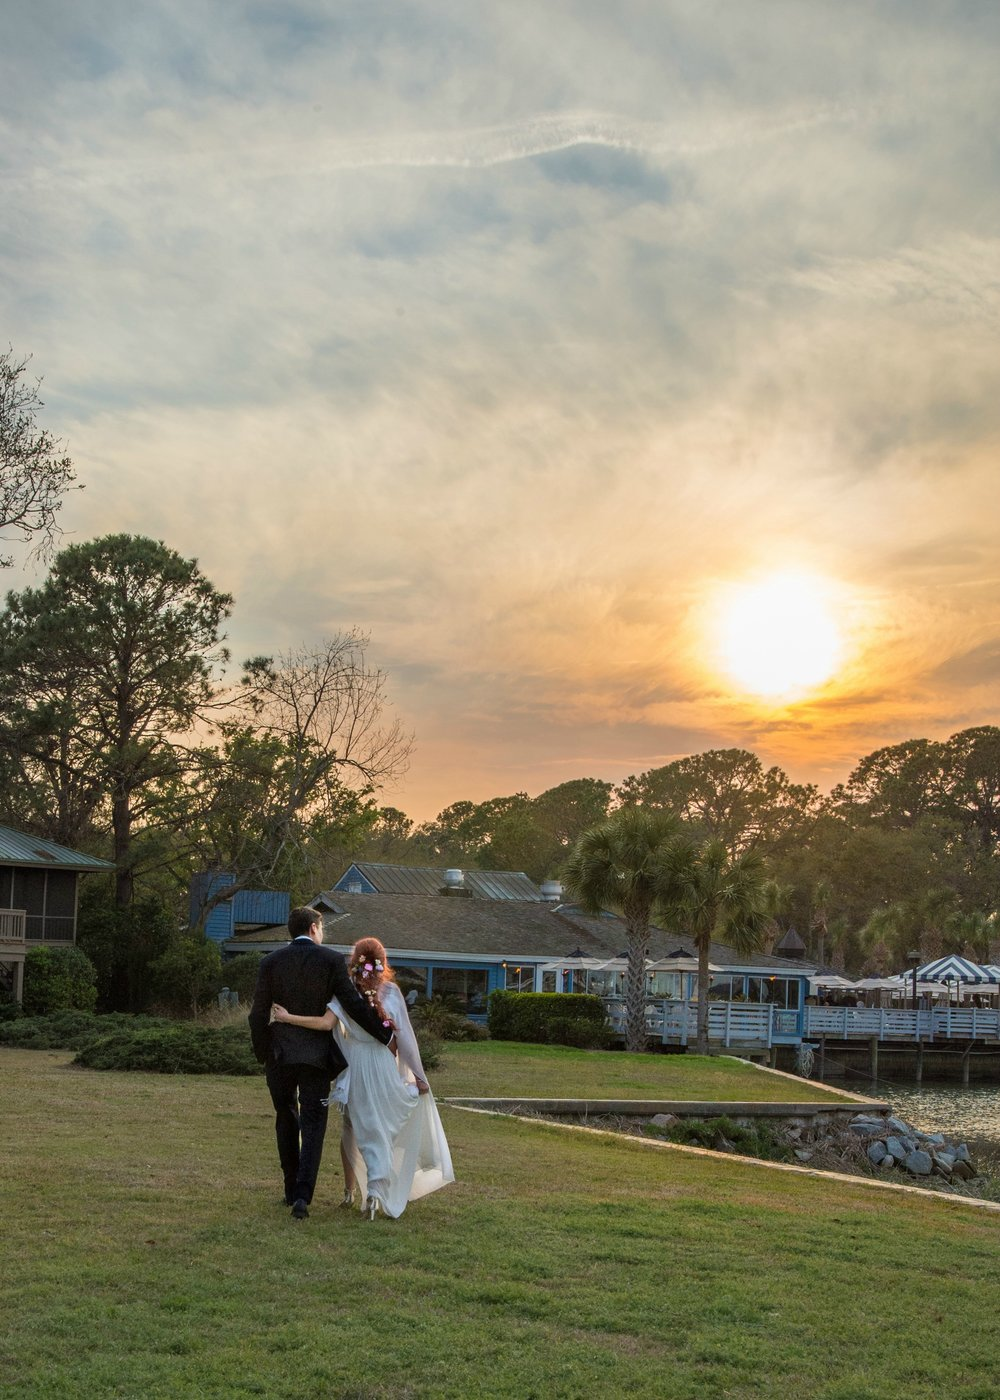 Kim & Erik's Hilton Head wedding at Wreck of the Salty Dog